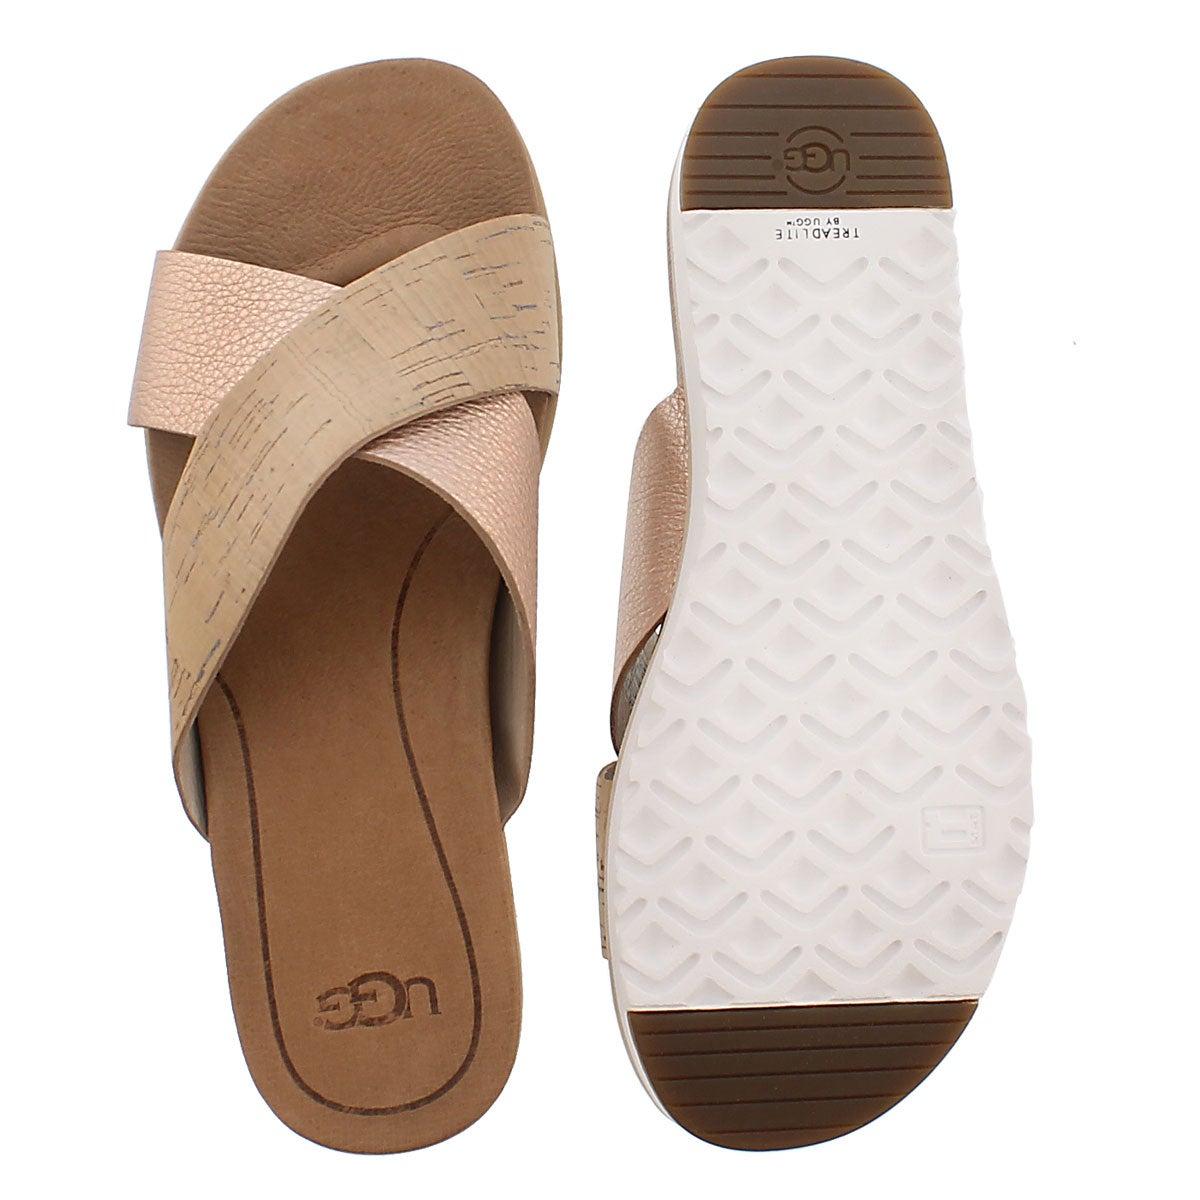 Sandale à enfiler Kari, liège/rose, fem